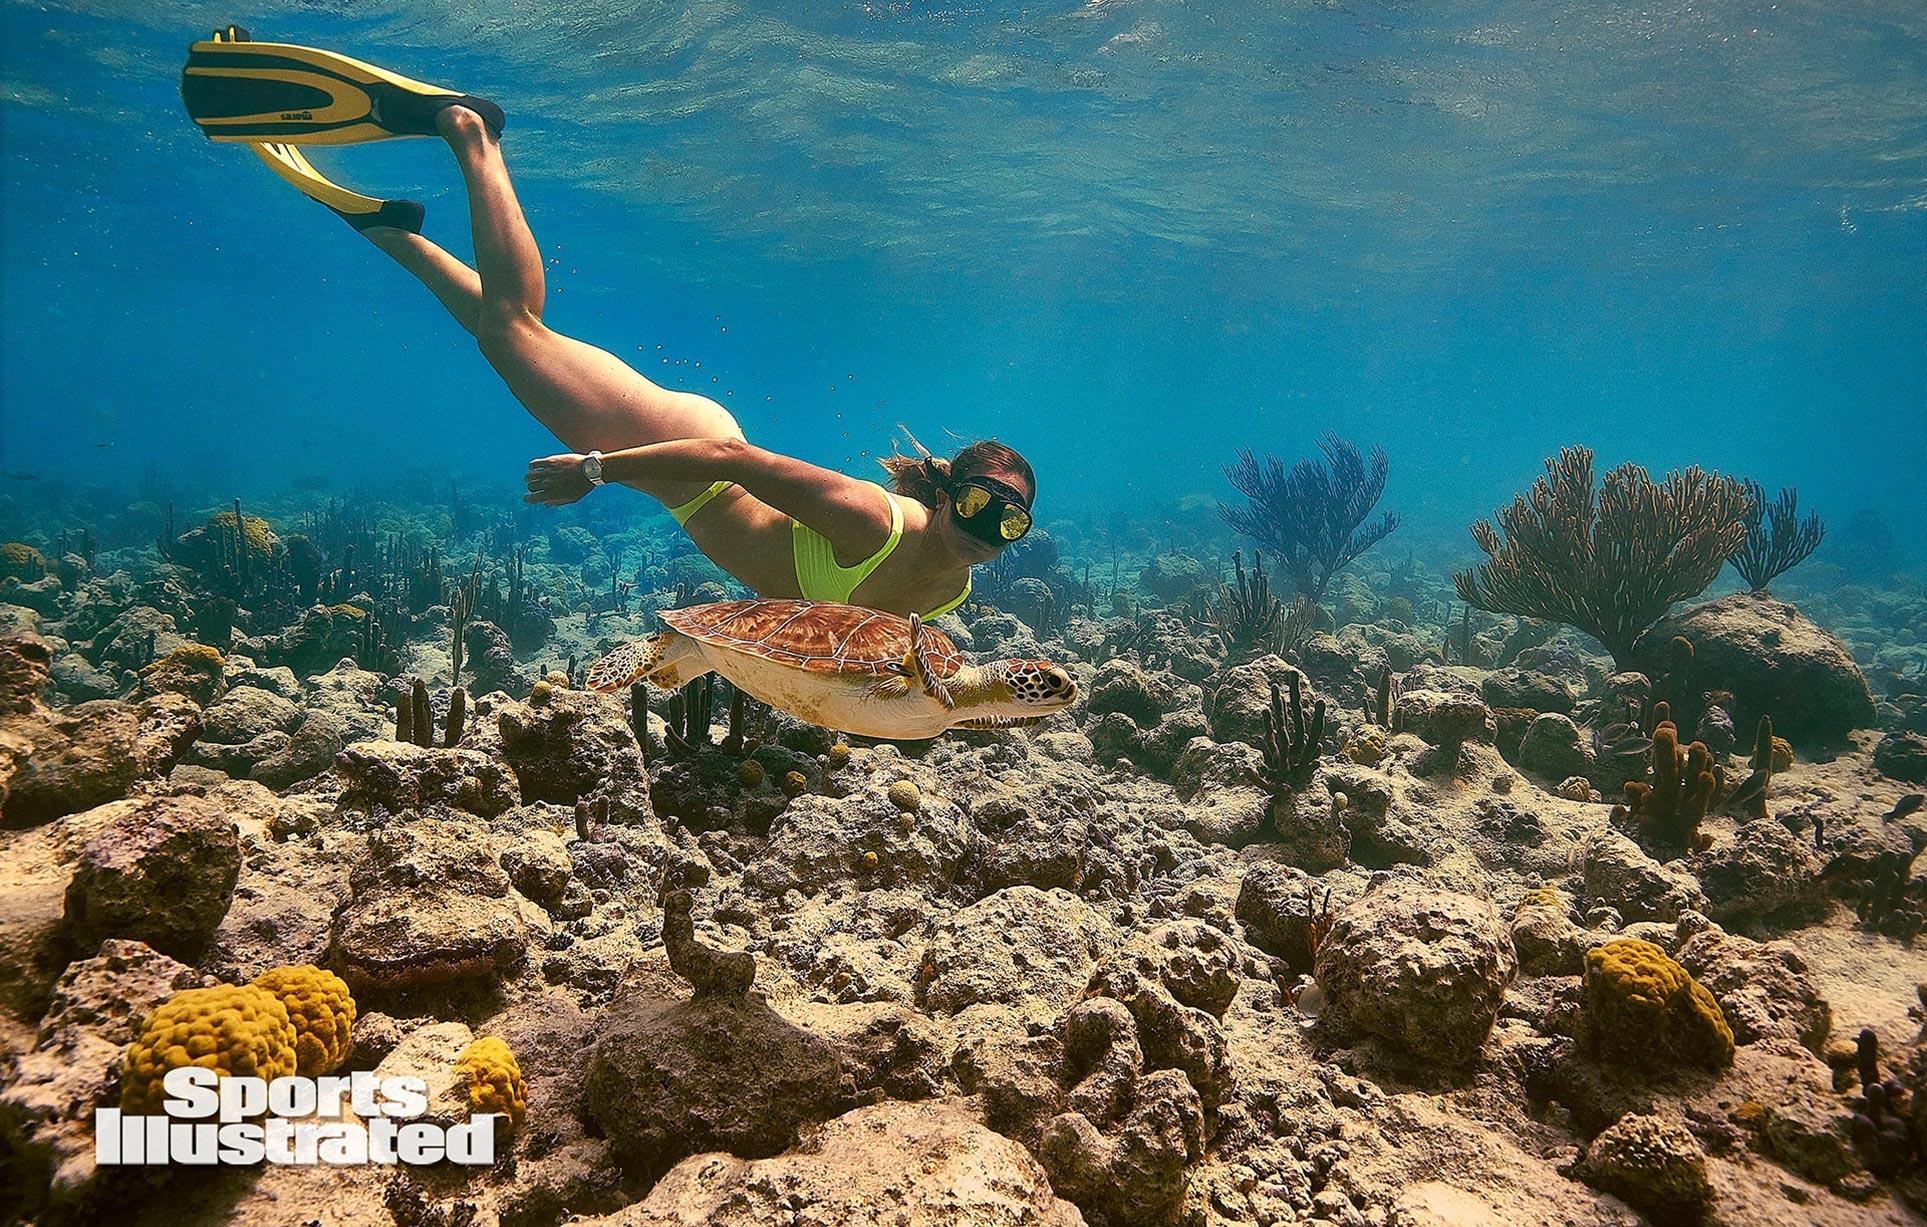 Кортни Конлог в каталоге купальников Sports Illustrated Swimsuit 2020 / фото 03